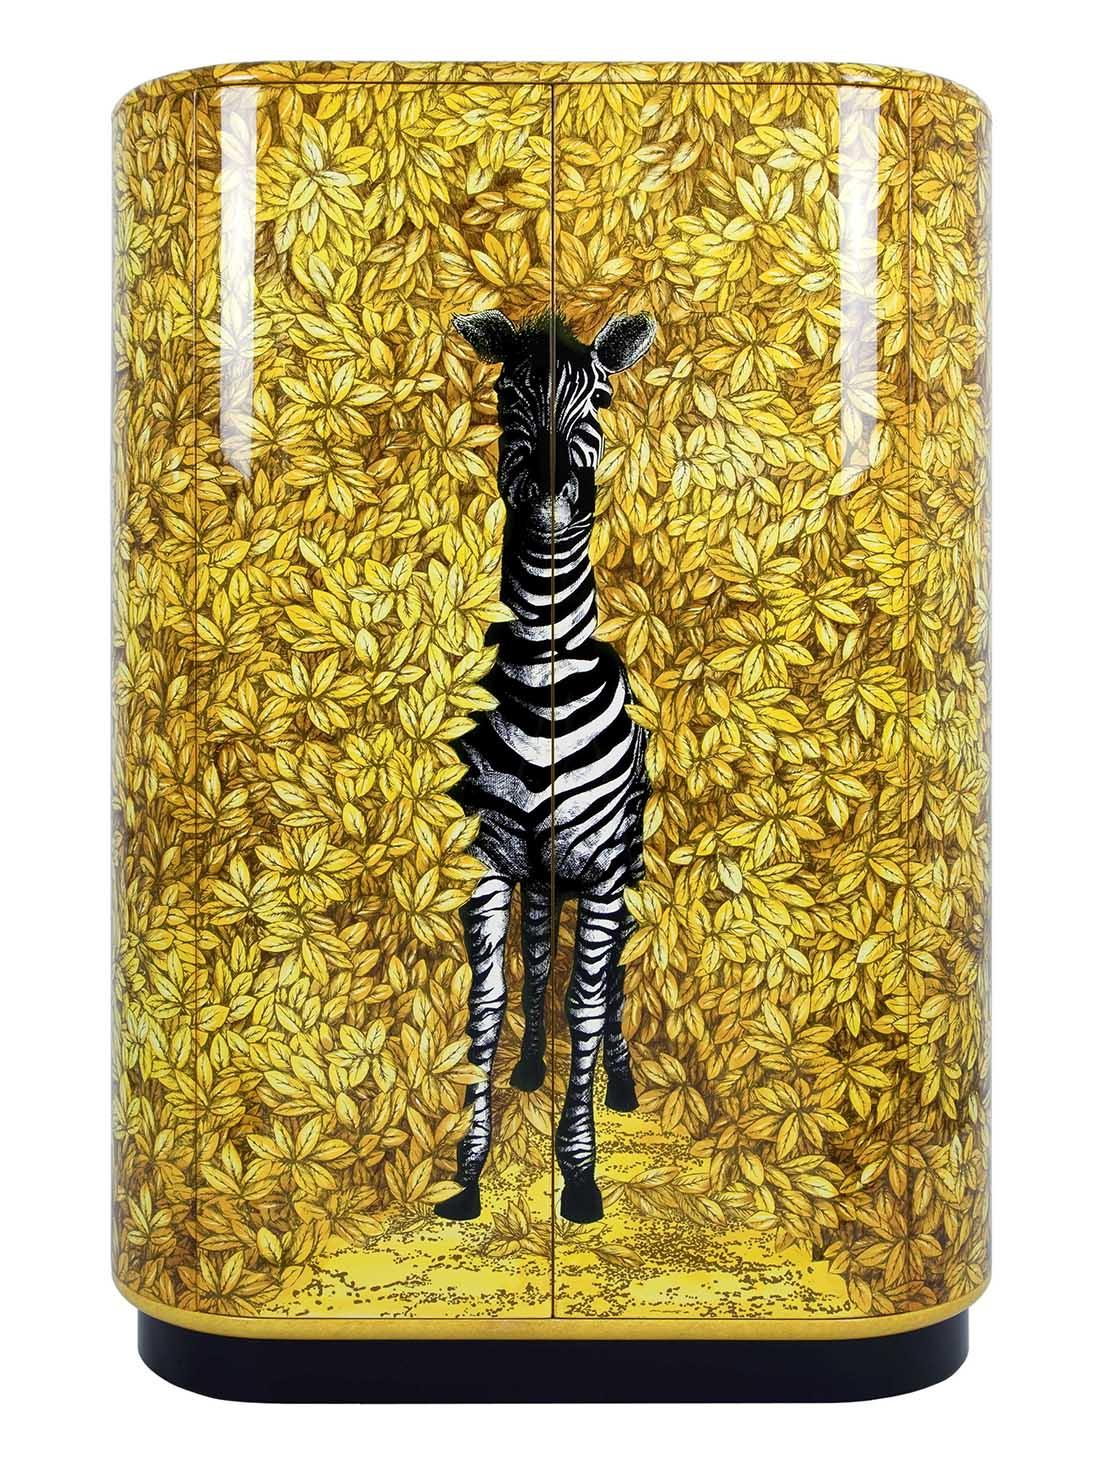 Zebra, design by Barnaba Fornasetti, 2003.